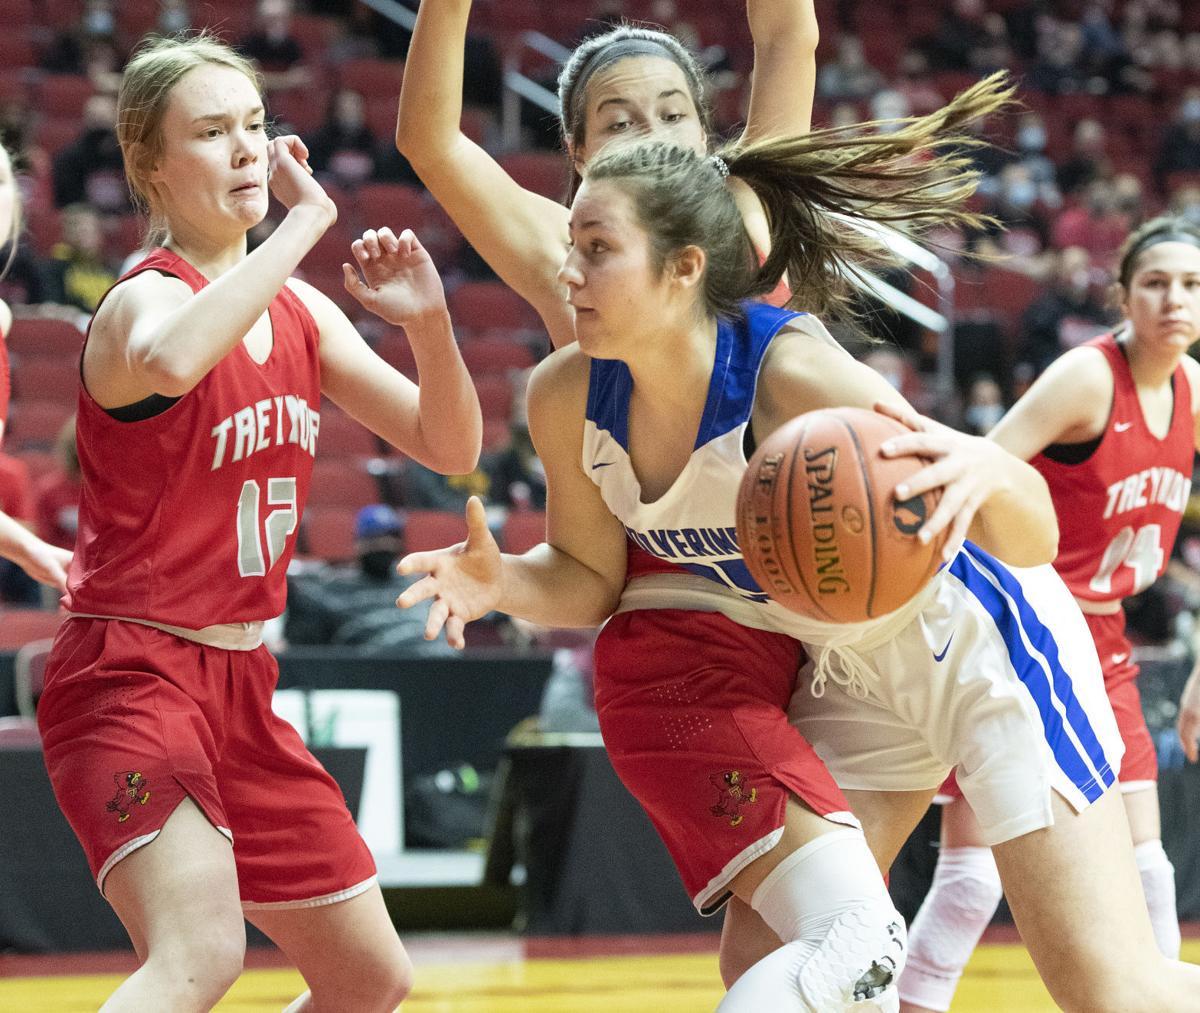 Dike-New Hartford vs Treynor girls state basketball